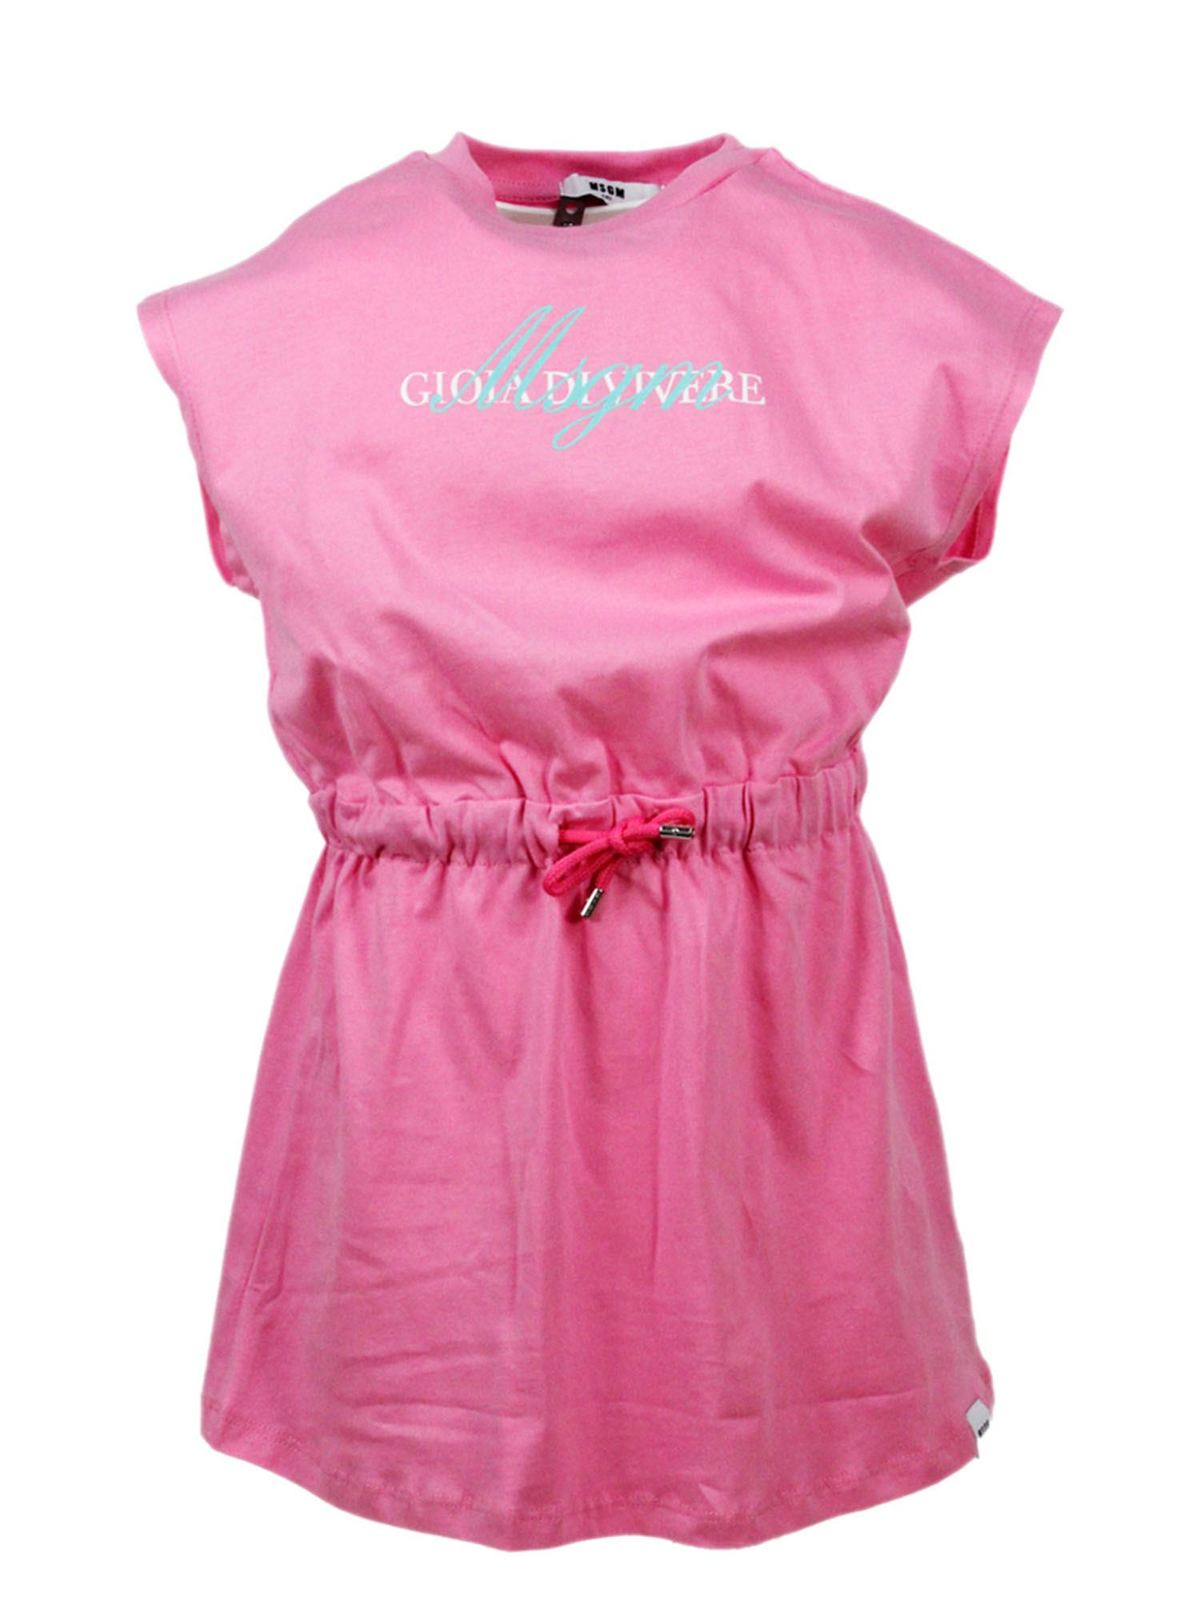 Msgm Cottons GIOIA DI VIVERE DRESS IN PINK